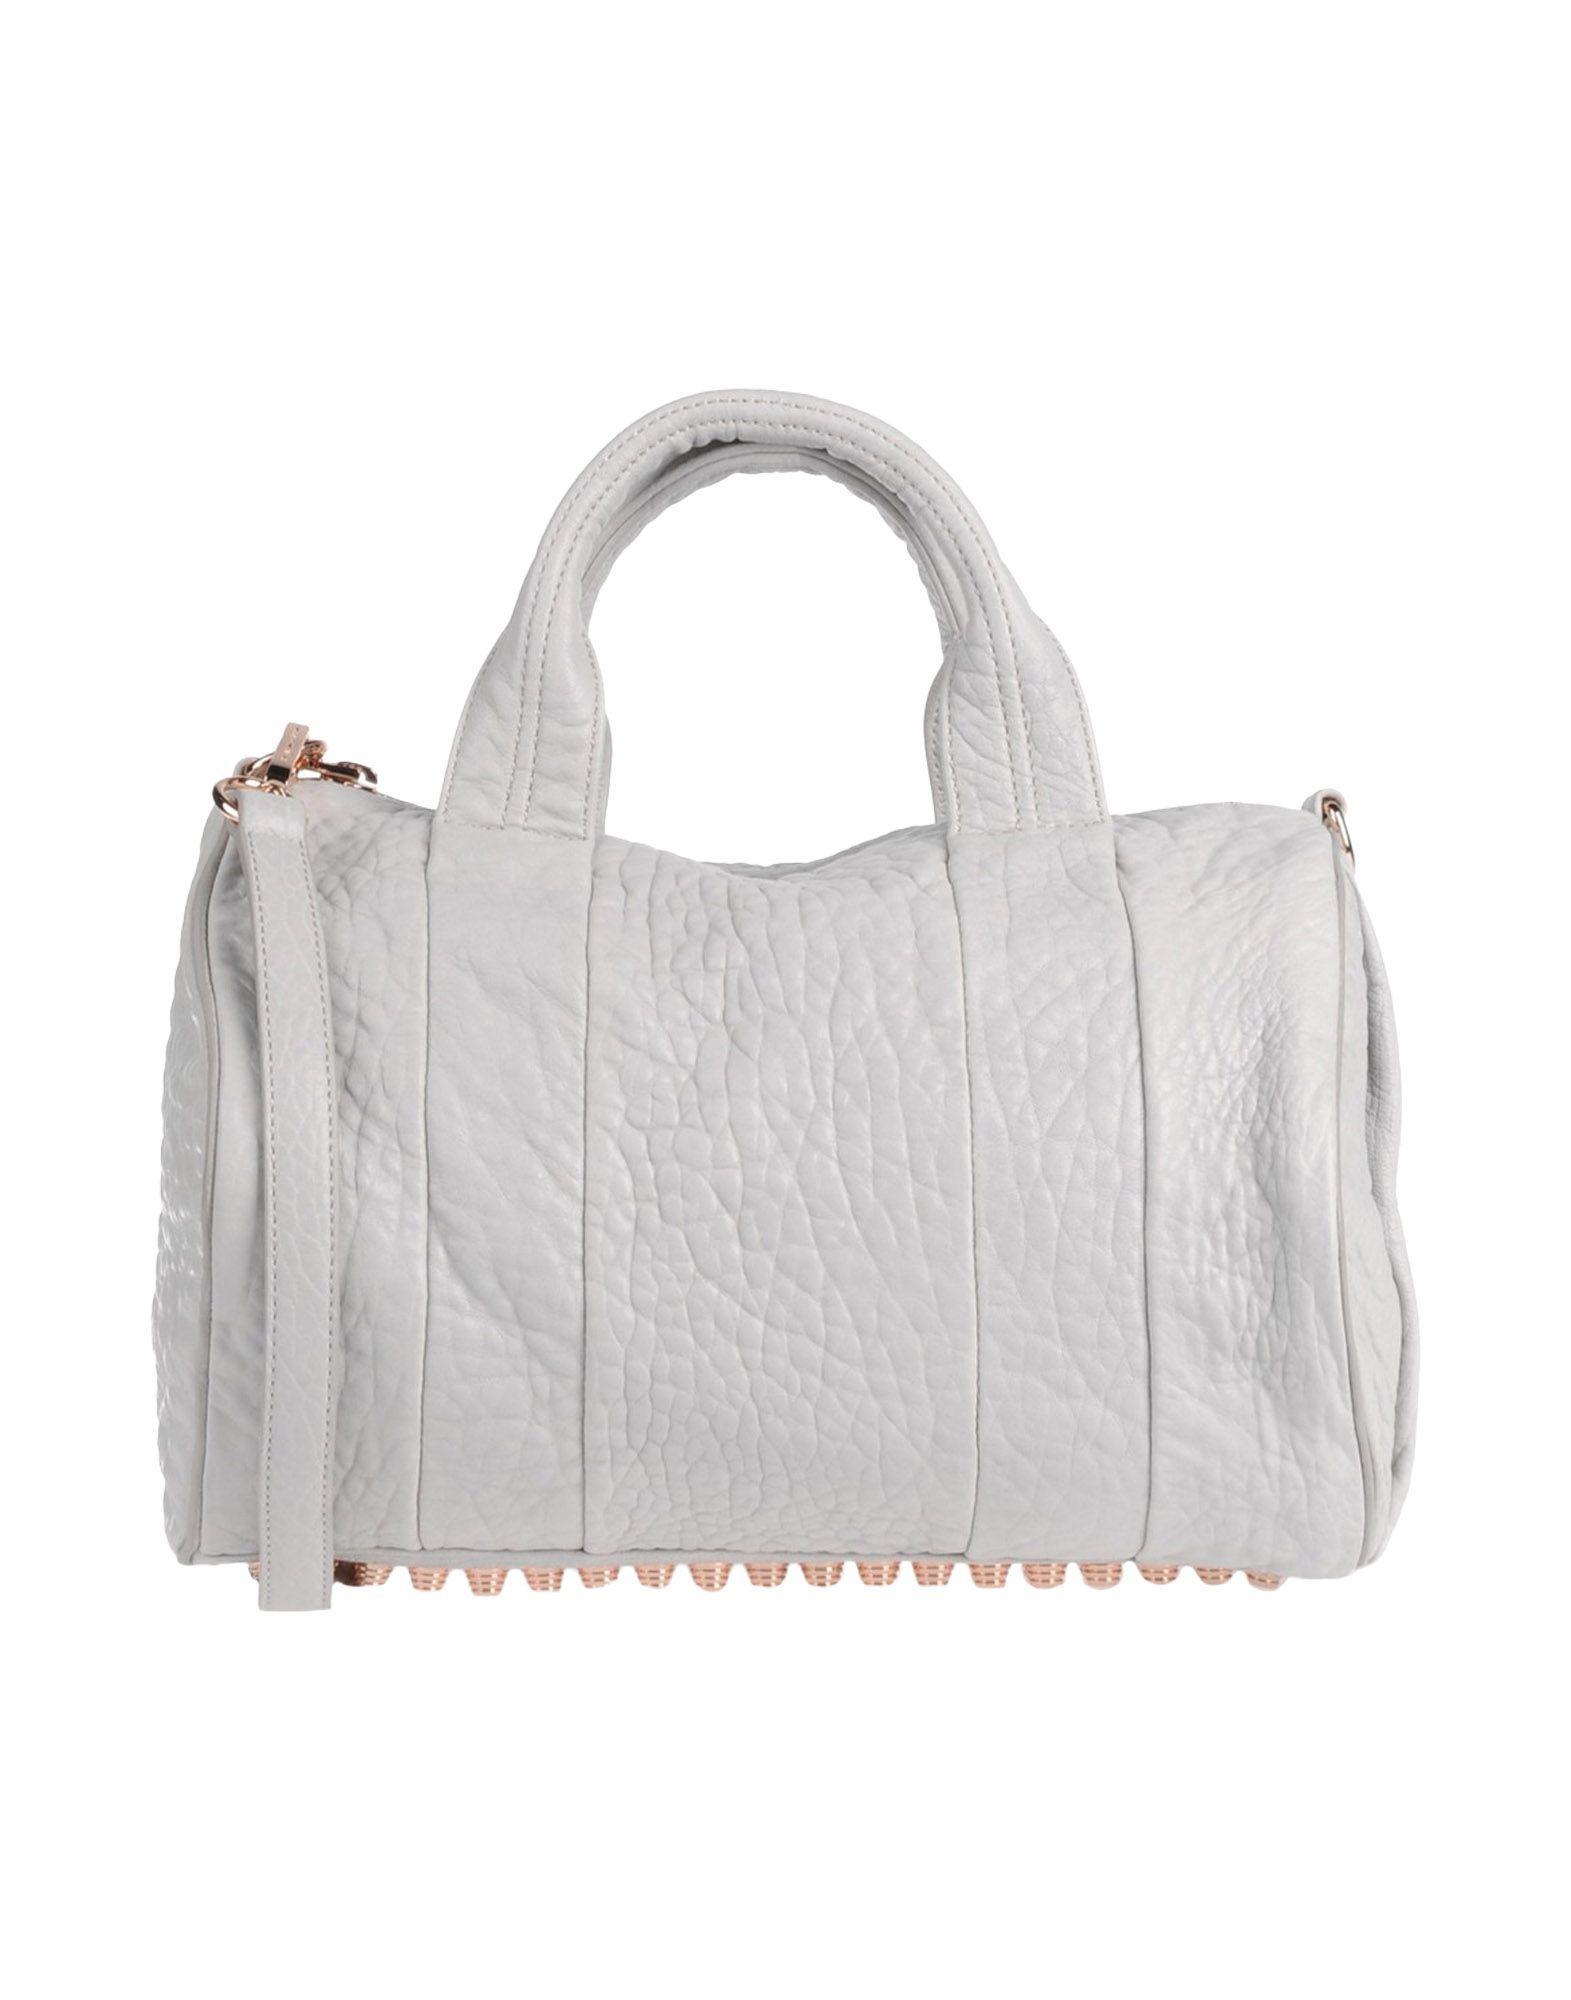 Alexander Wang HANDBAGS - Handbags su YOOX.COM QMfMc